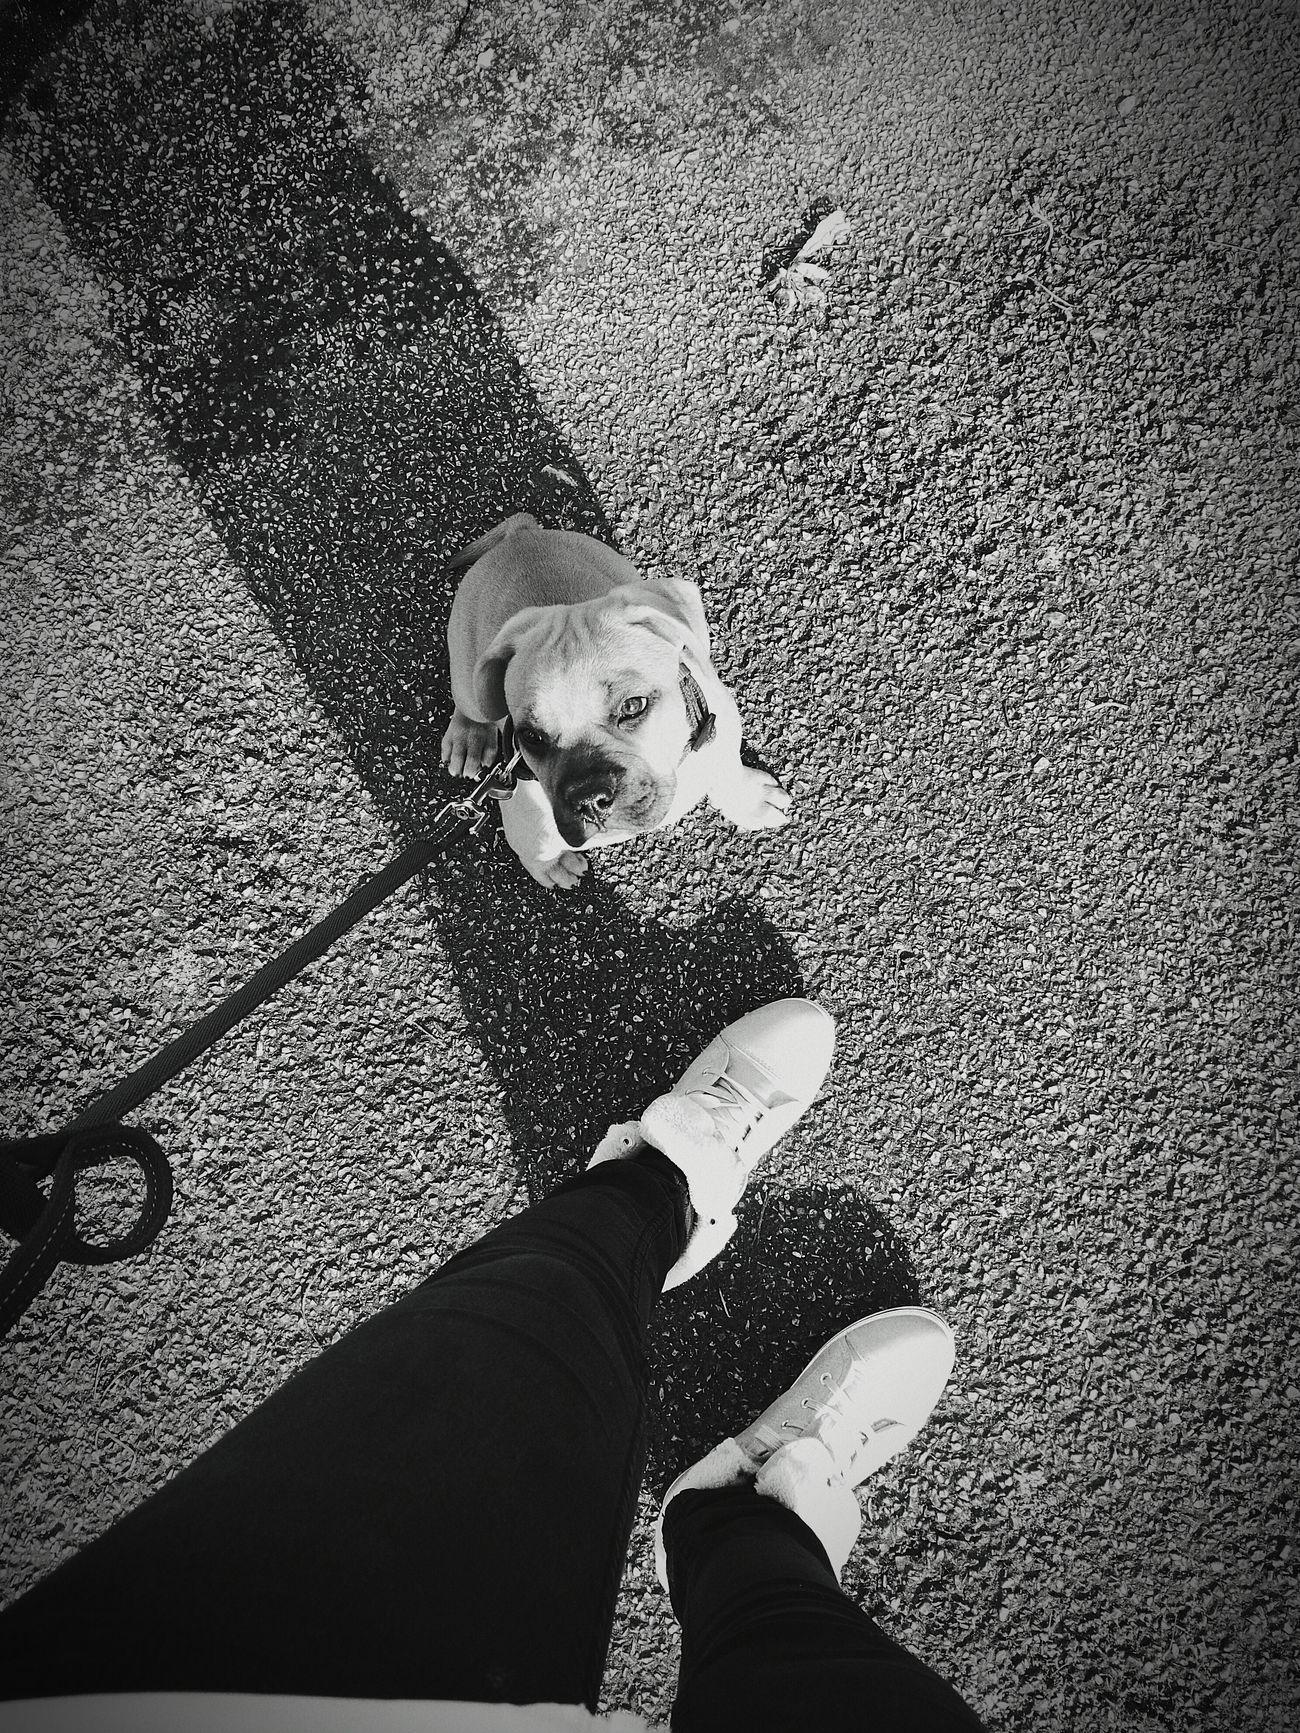 Human Leg Outdoors Babydog